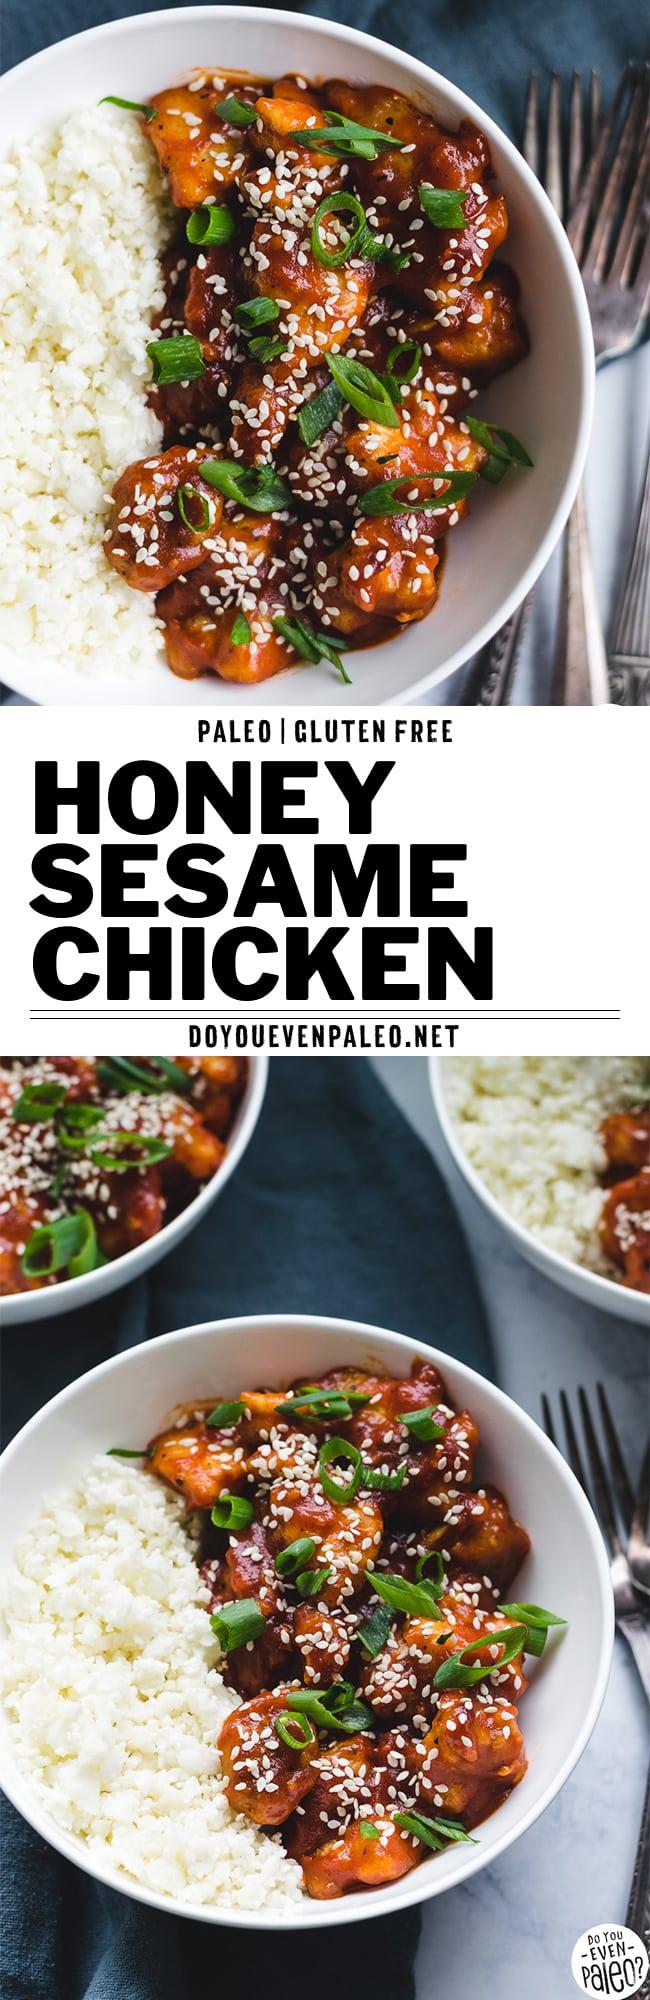 Paleo Honey Sesame Chicken Recipe Pin | DoYouEvenPaleo.net